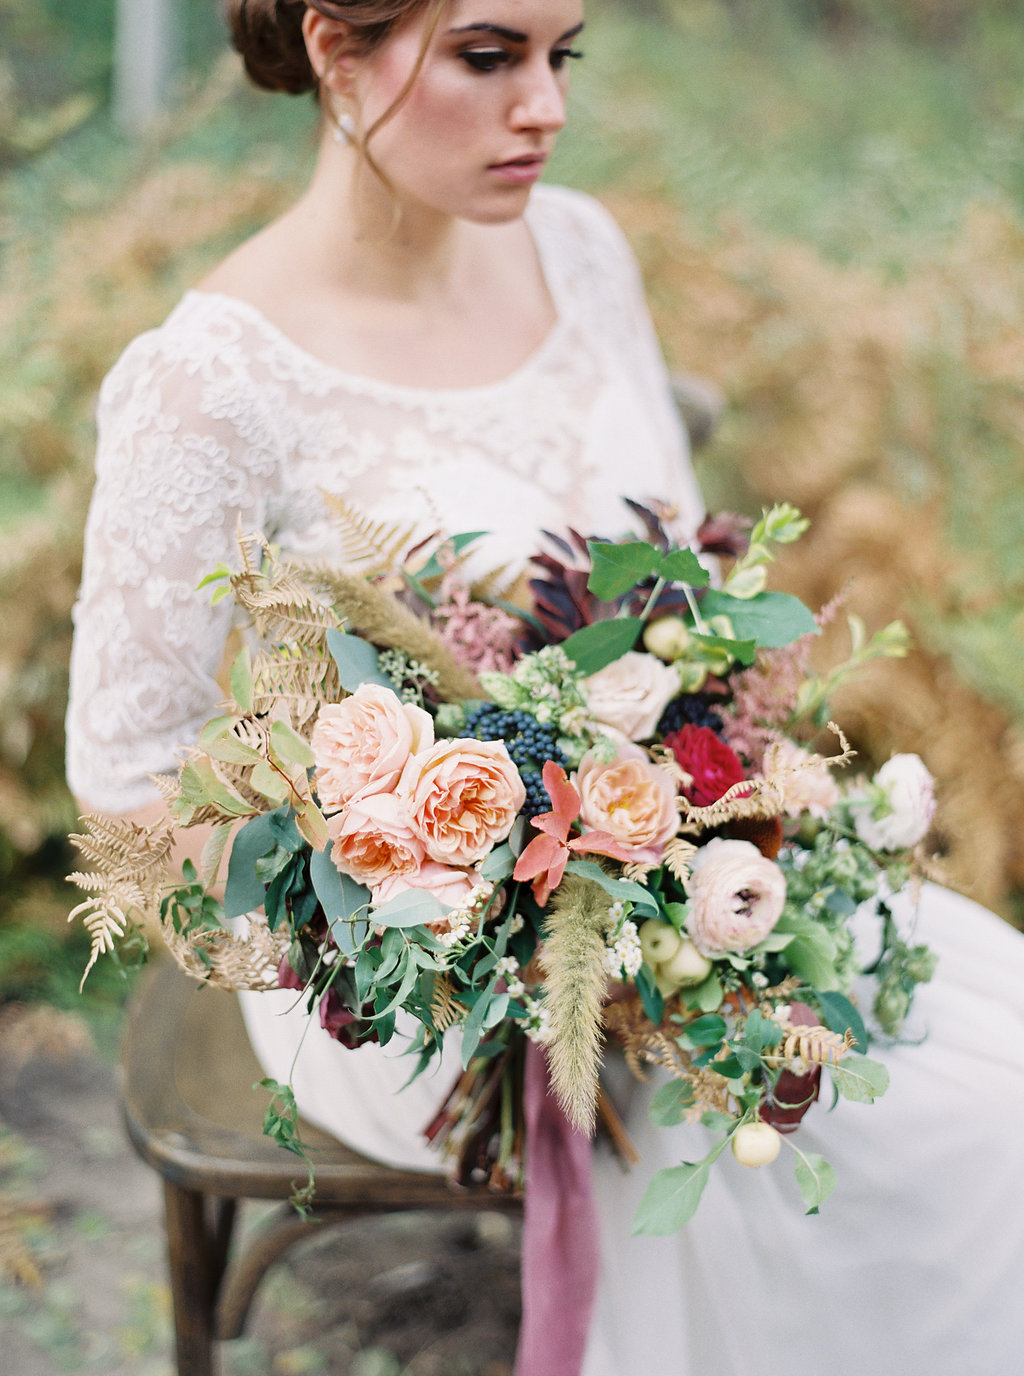 Loose, organic bridal bouquet with garden roses, berries, and hops // Nashville Floral Designer